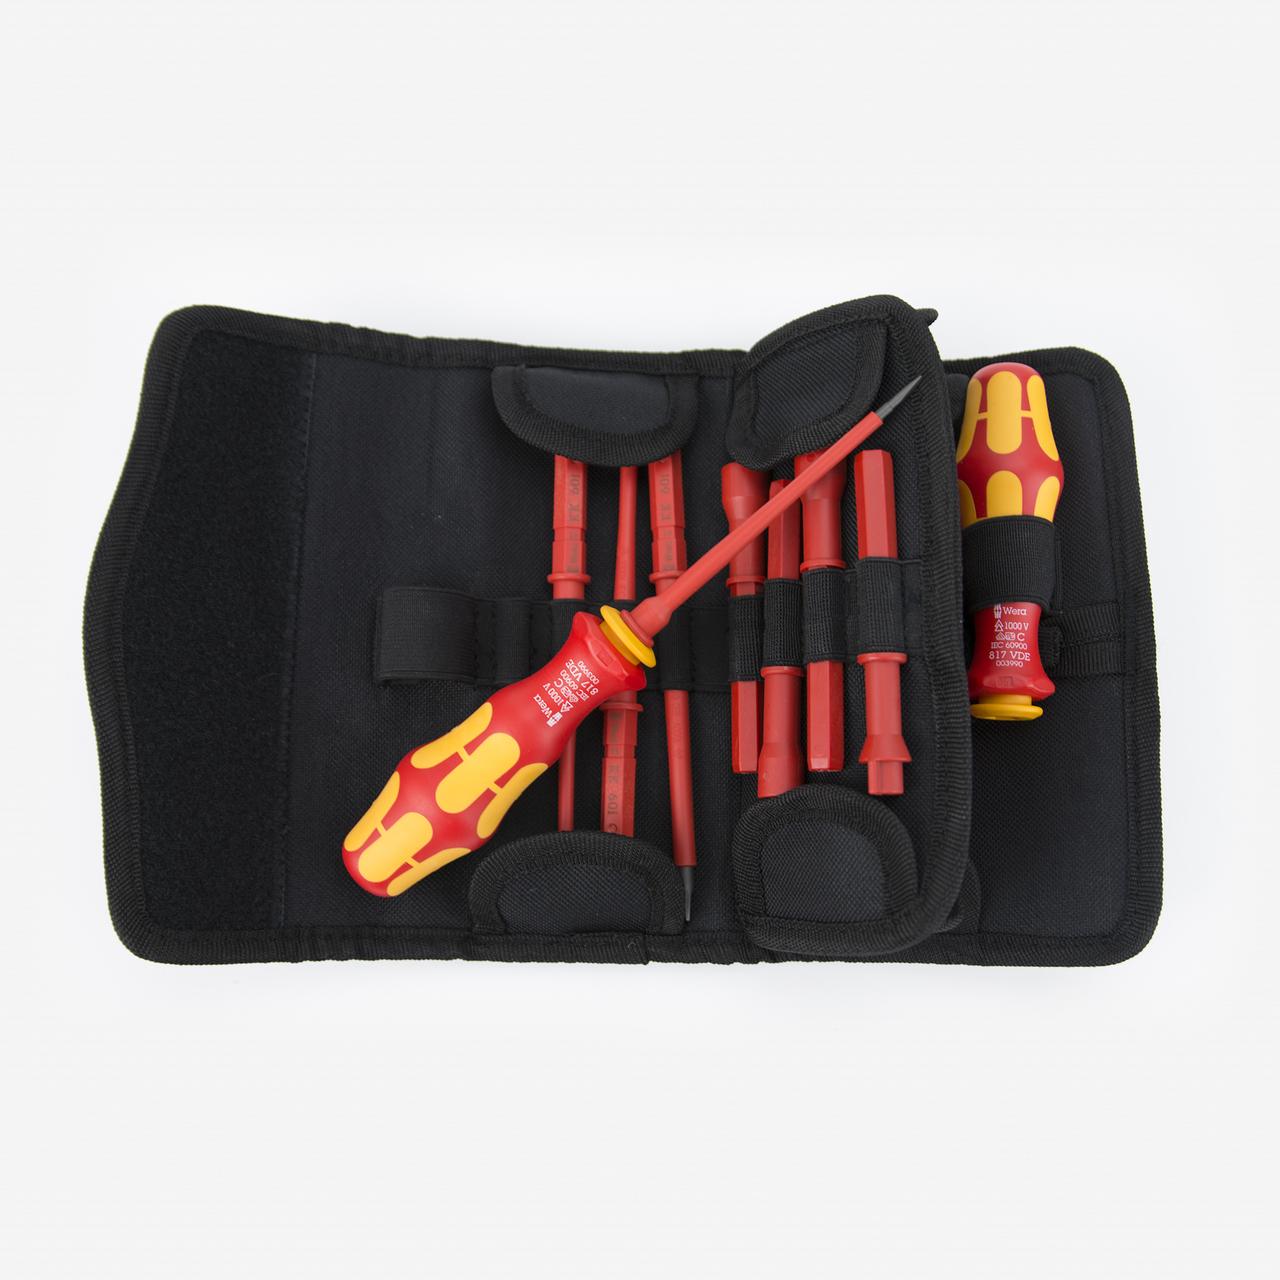 Wera 347107 Kraftform Kompakt VDE 60 i/62 i/65 i/18 Slotted/Phillips/PoziDriv/Cabinet Insulated Blade Set - KC Tool